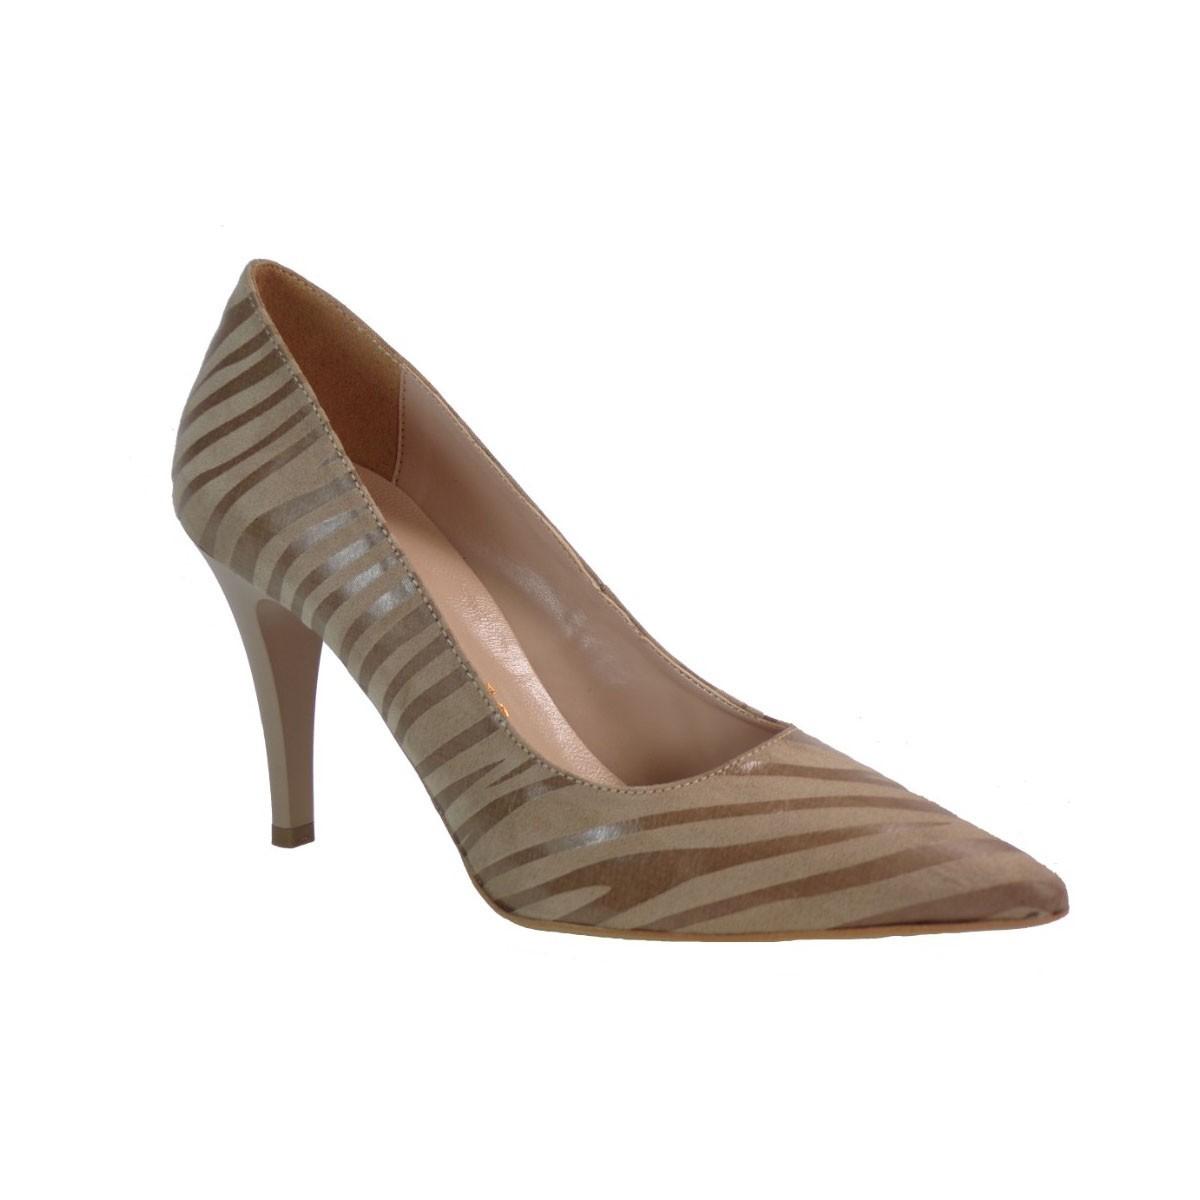 Envie Shoes Γυναικεία Παπούτσια E02-05082 Μπεζ Envies shoes Ε02-05082 Μπεζ